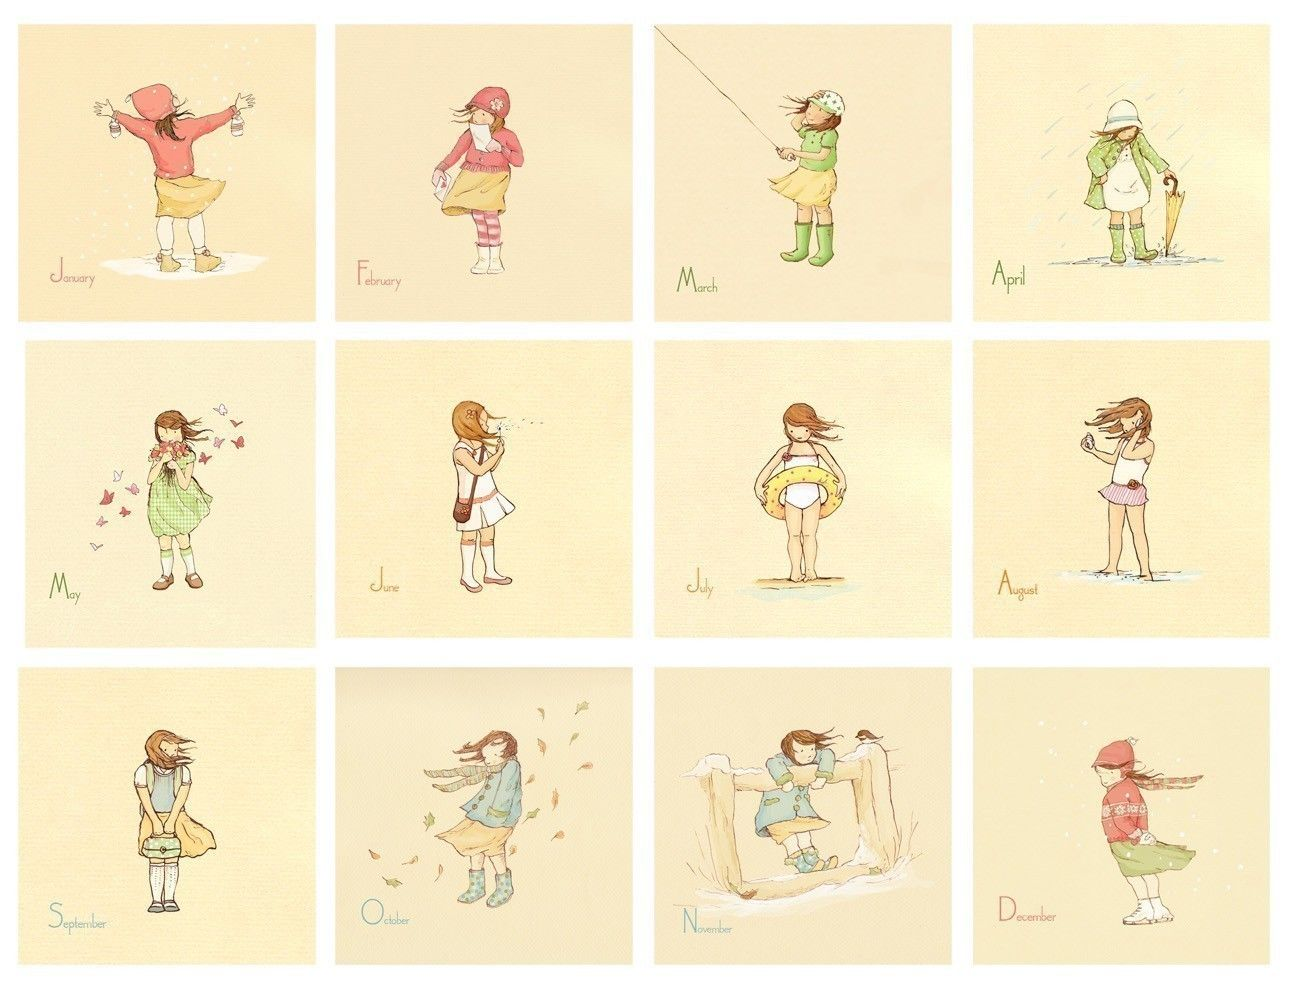 monthly artwork | FOR THE HOME | Pinterest | Nursery room decor ...